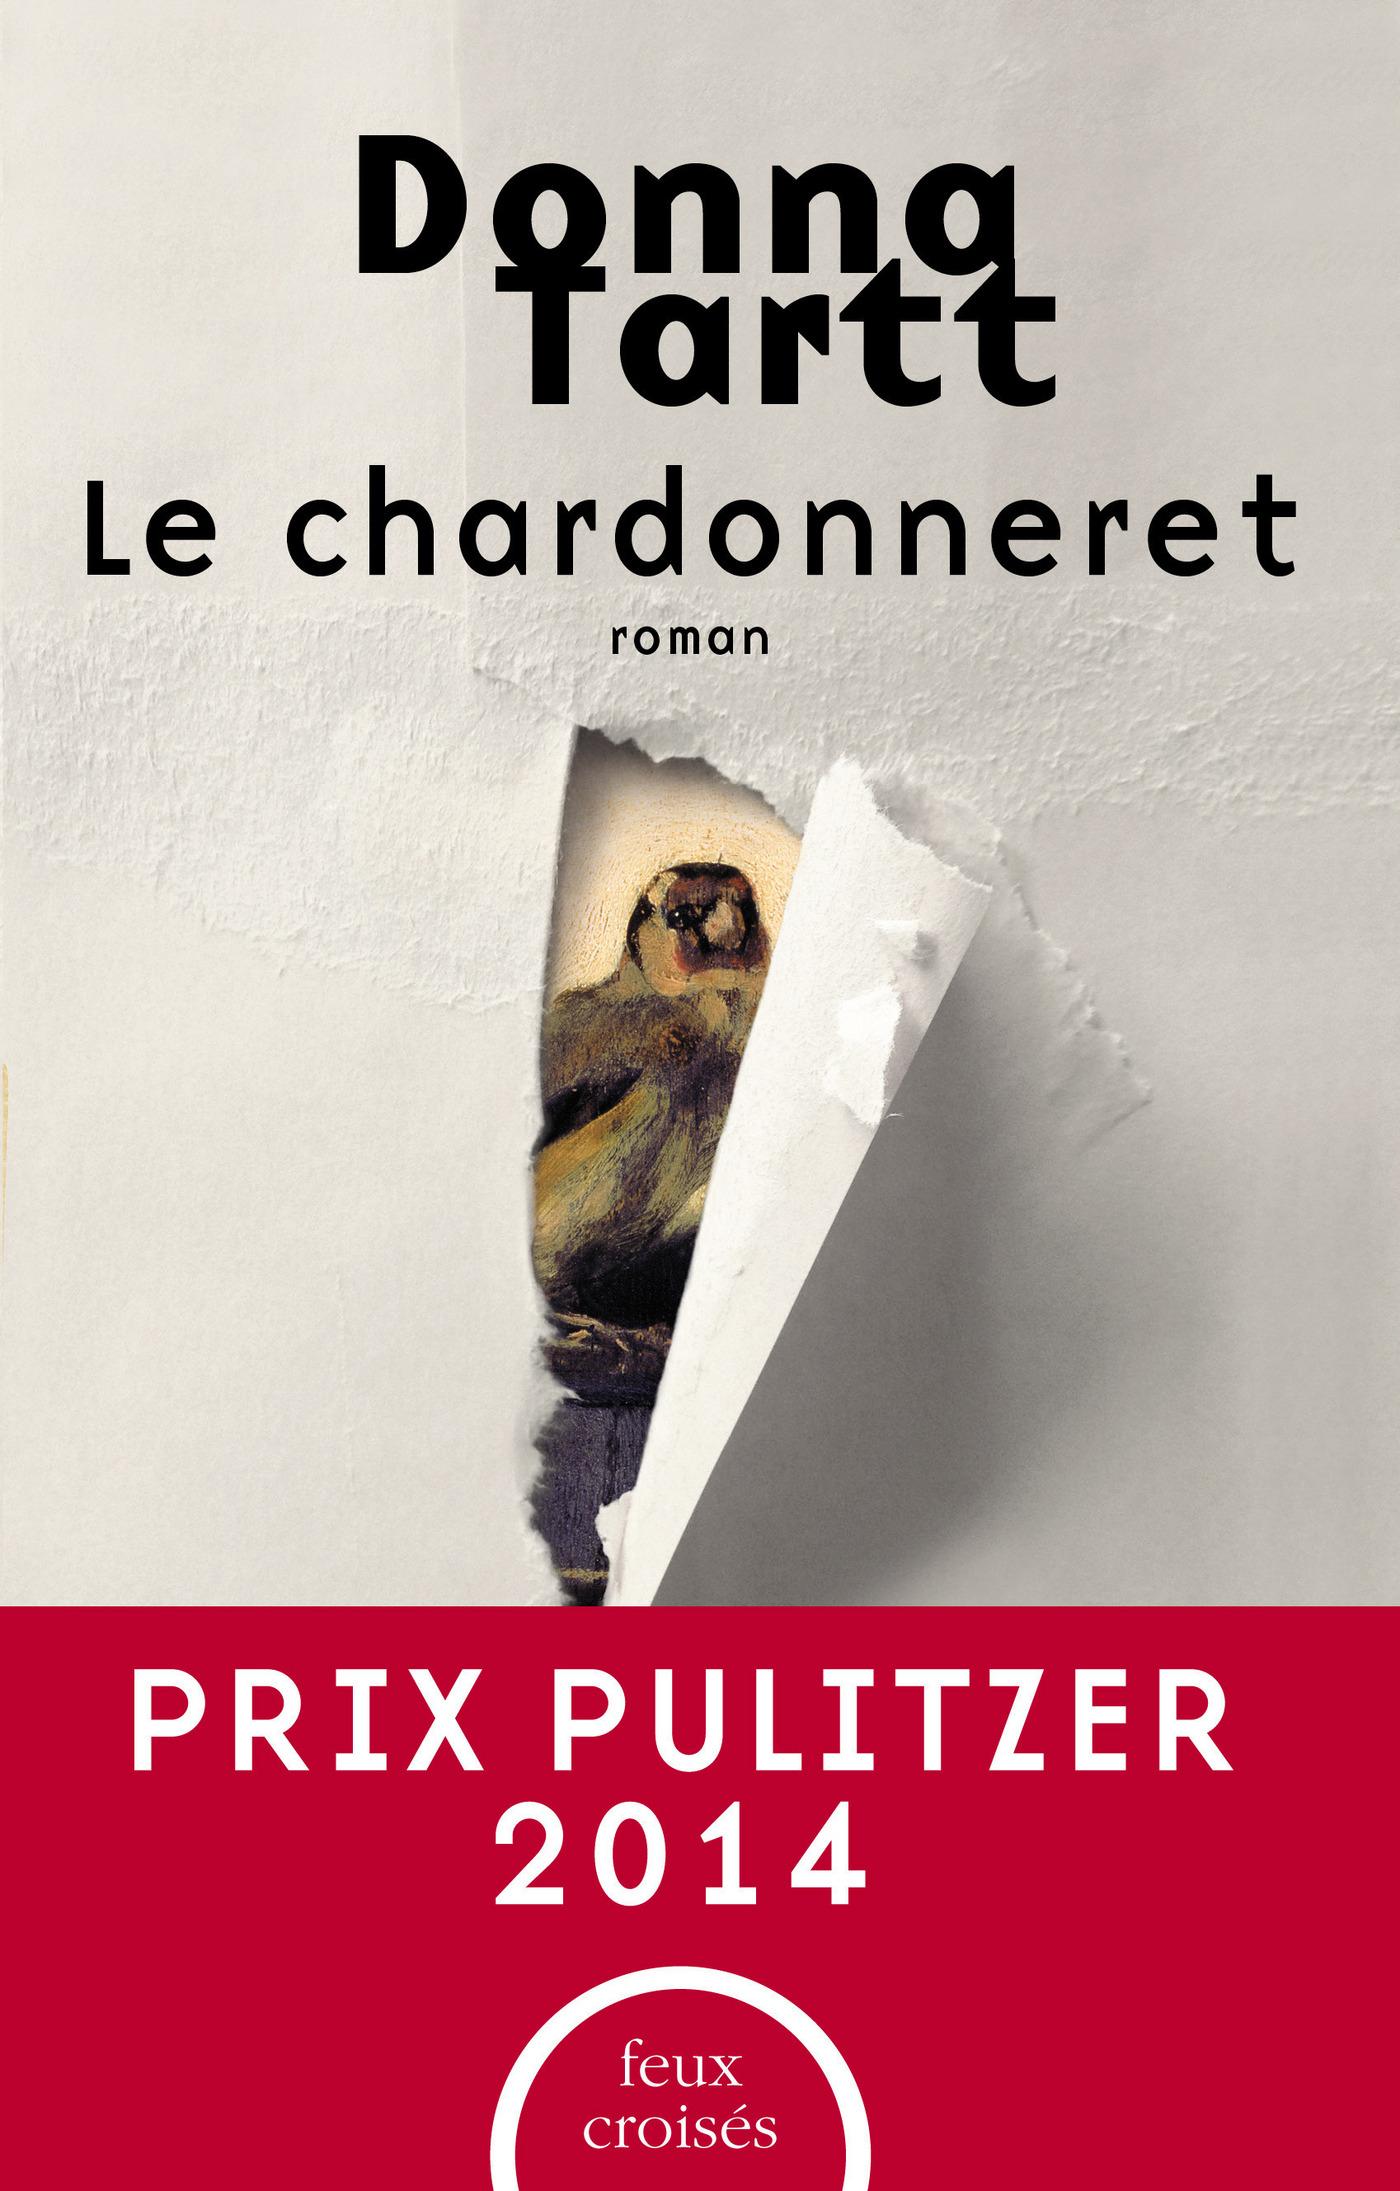 Le Chardonneret | TARTT, Donna